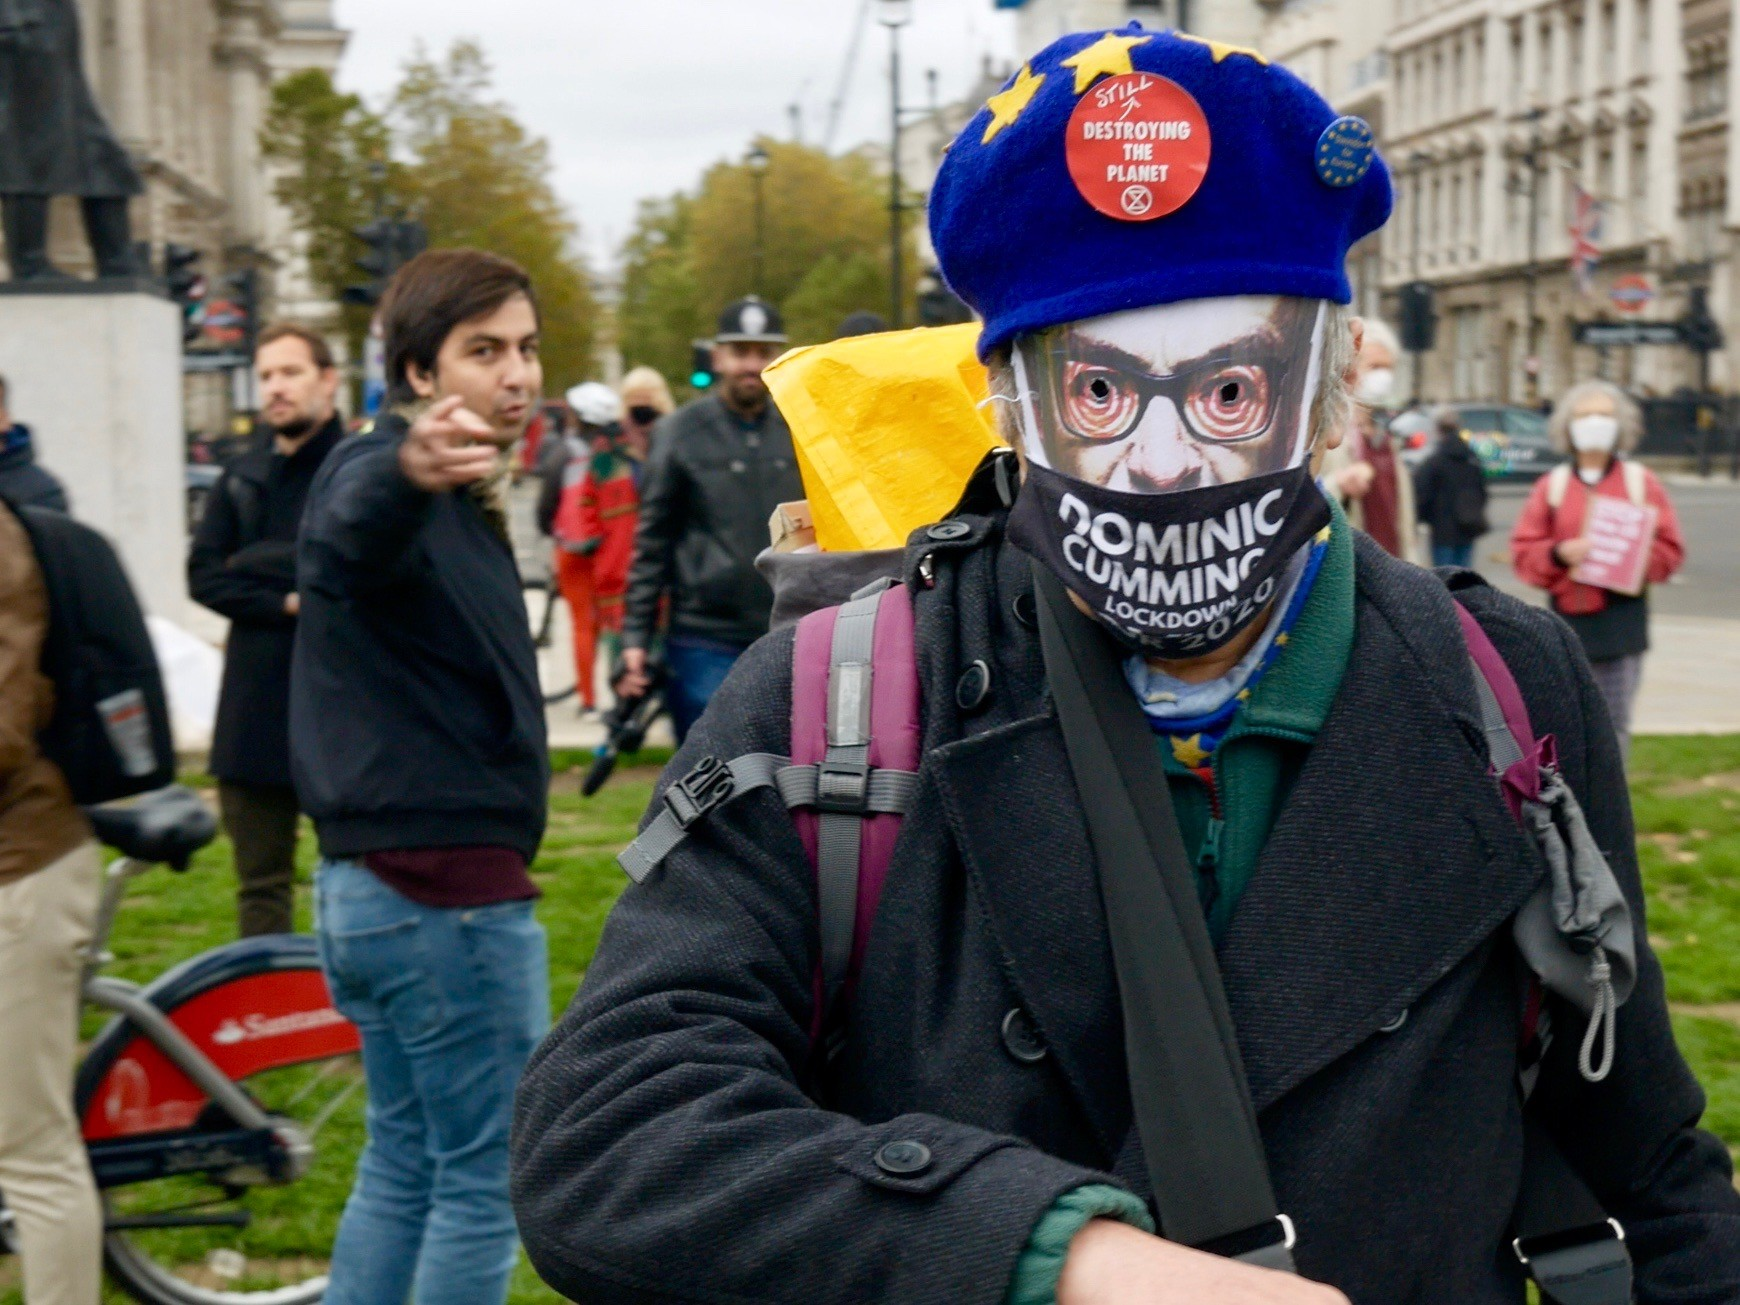 A man poses in a Dominic Cummings mask and EU cap at the Stop Trump Coalition Protest in London, October 24, 2020. Kurt Zindulka, Breitbart News